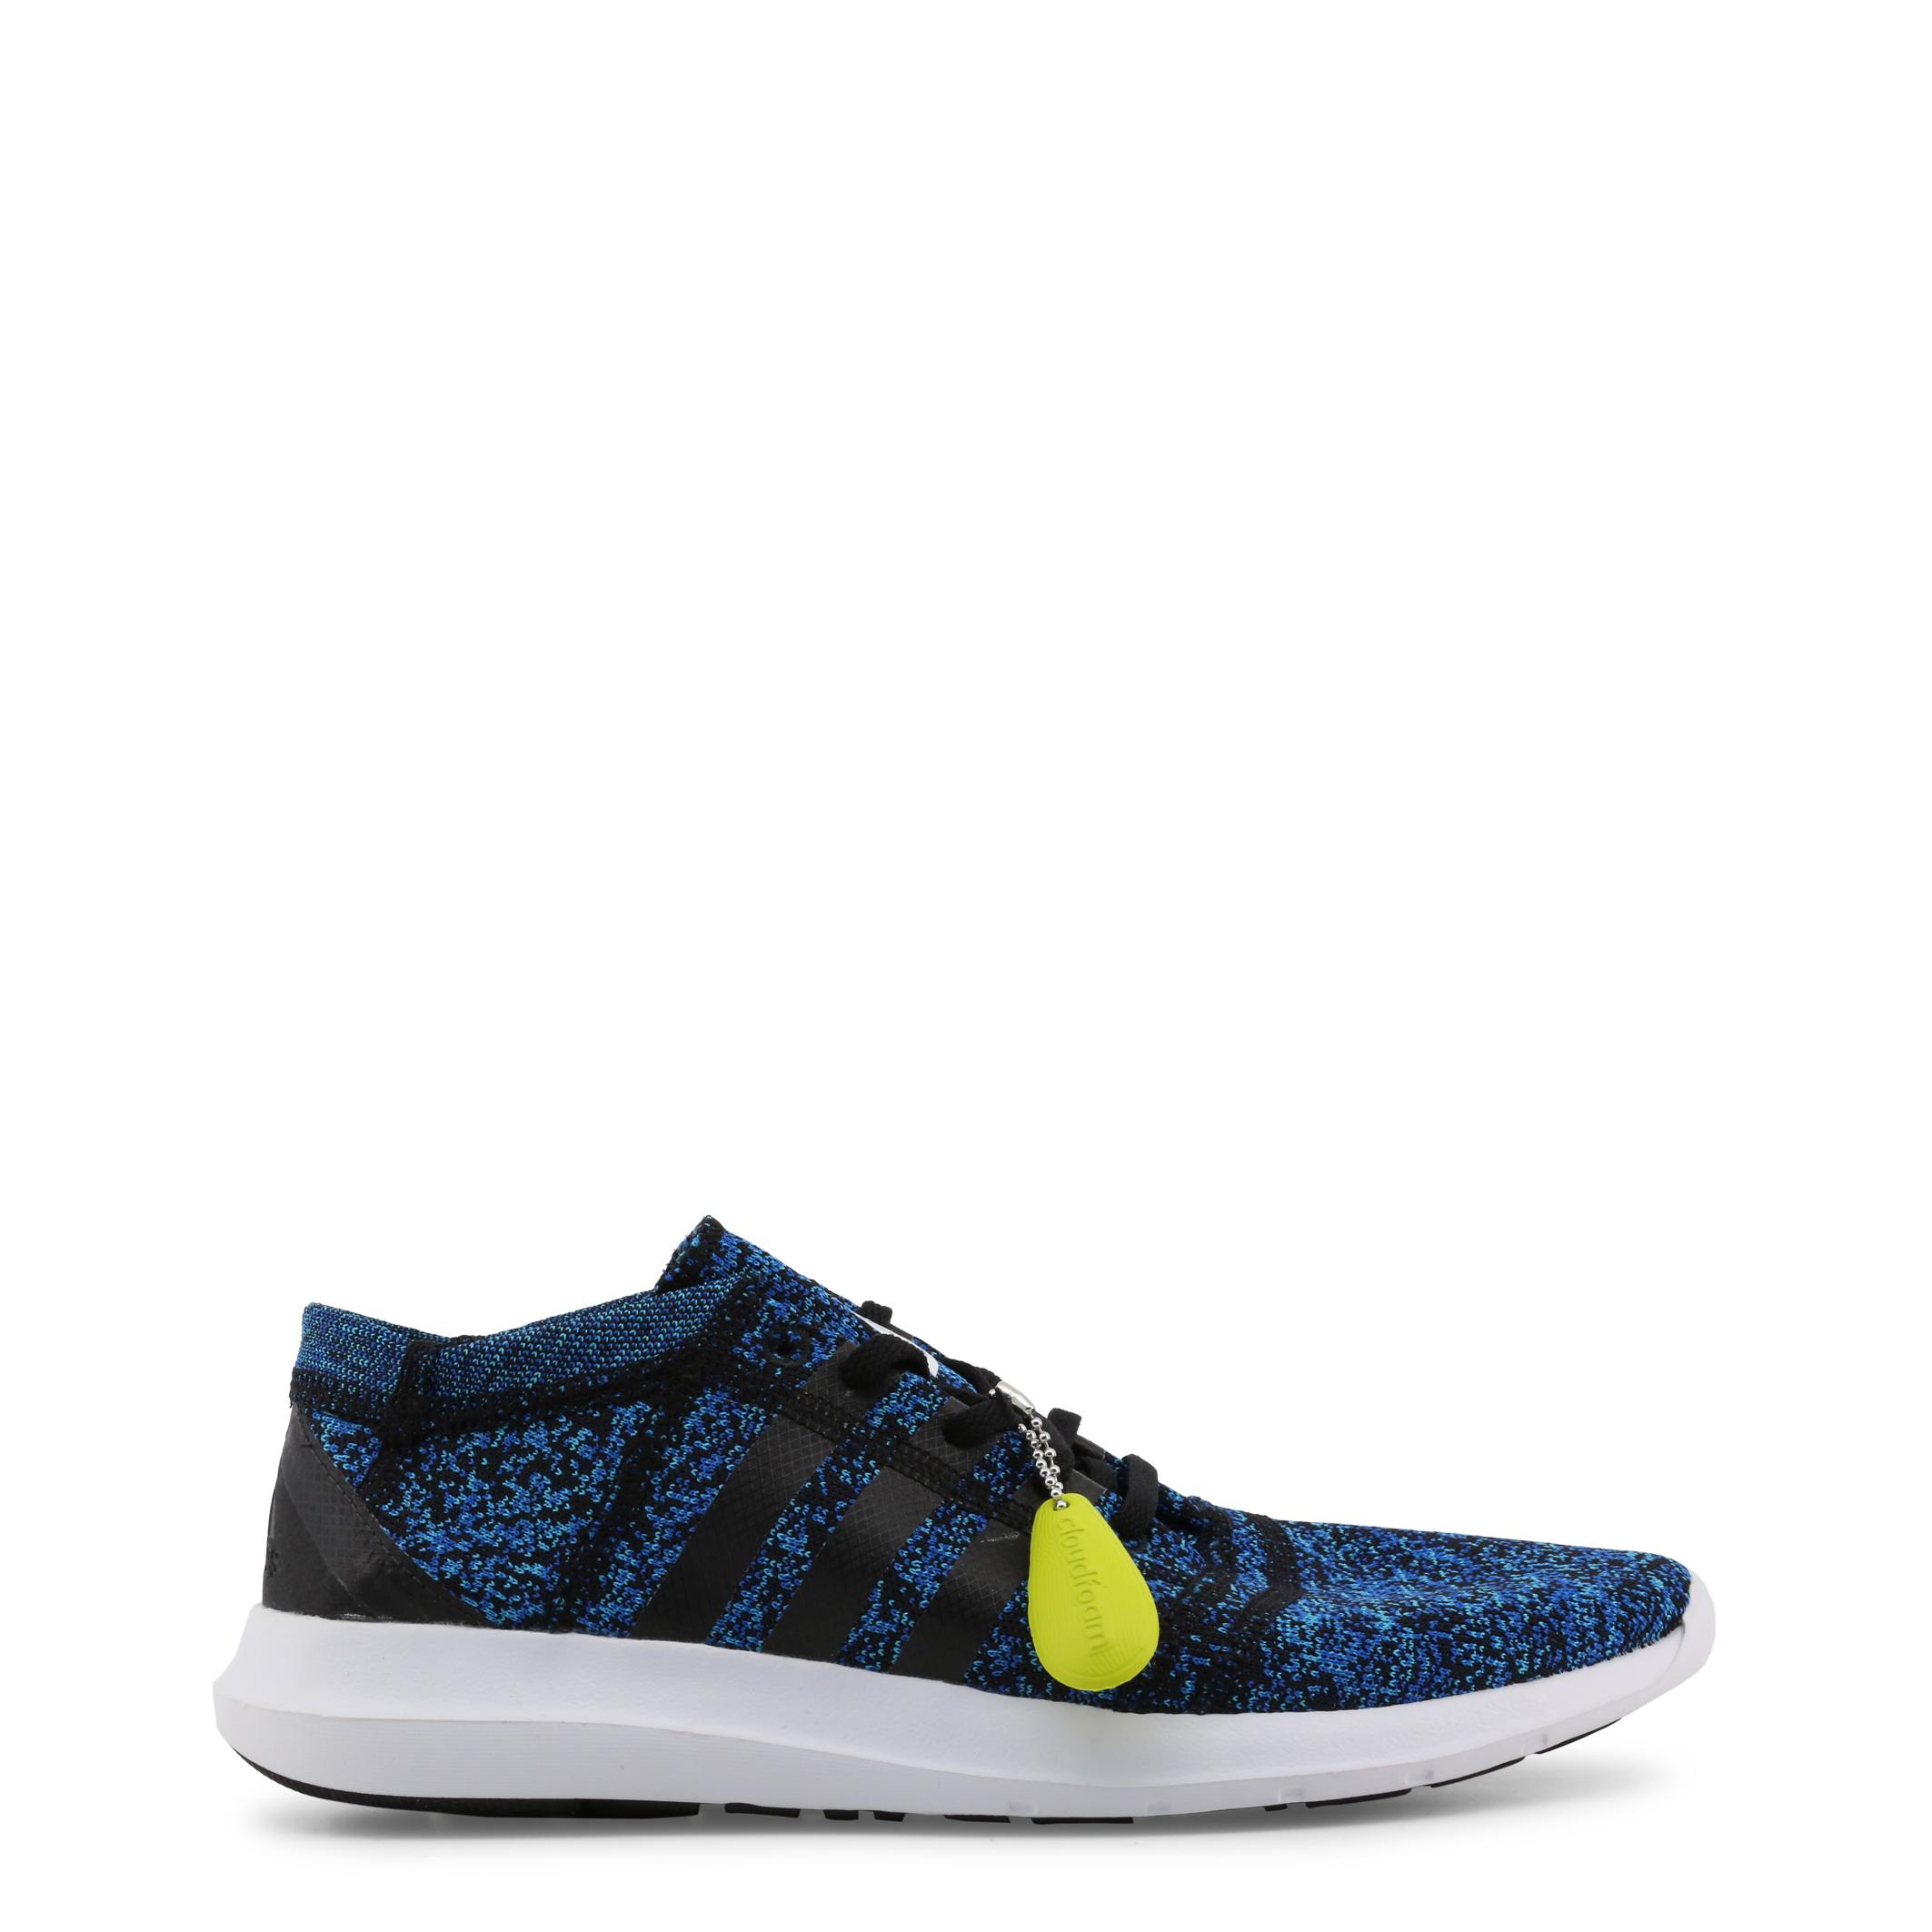 Adidas ELEMENTS-REFINE2